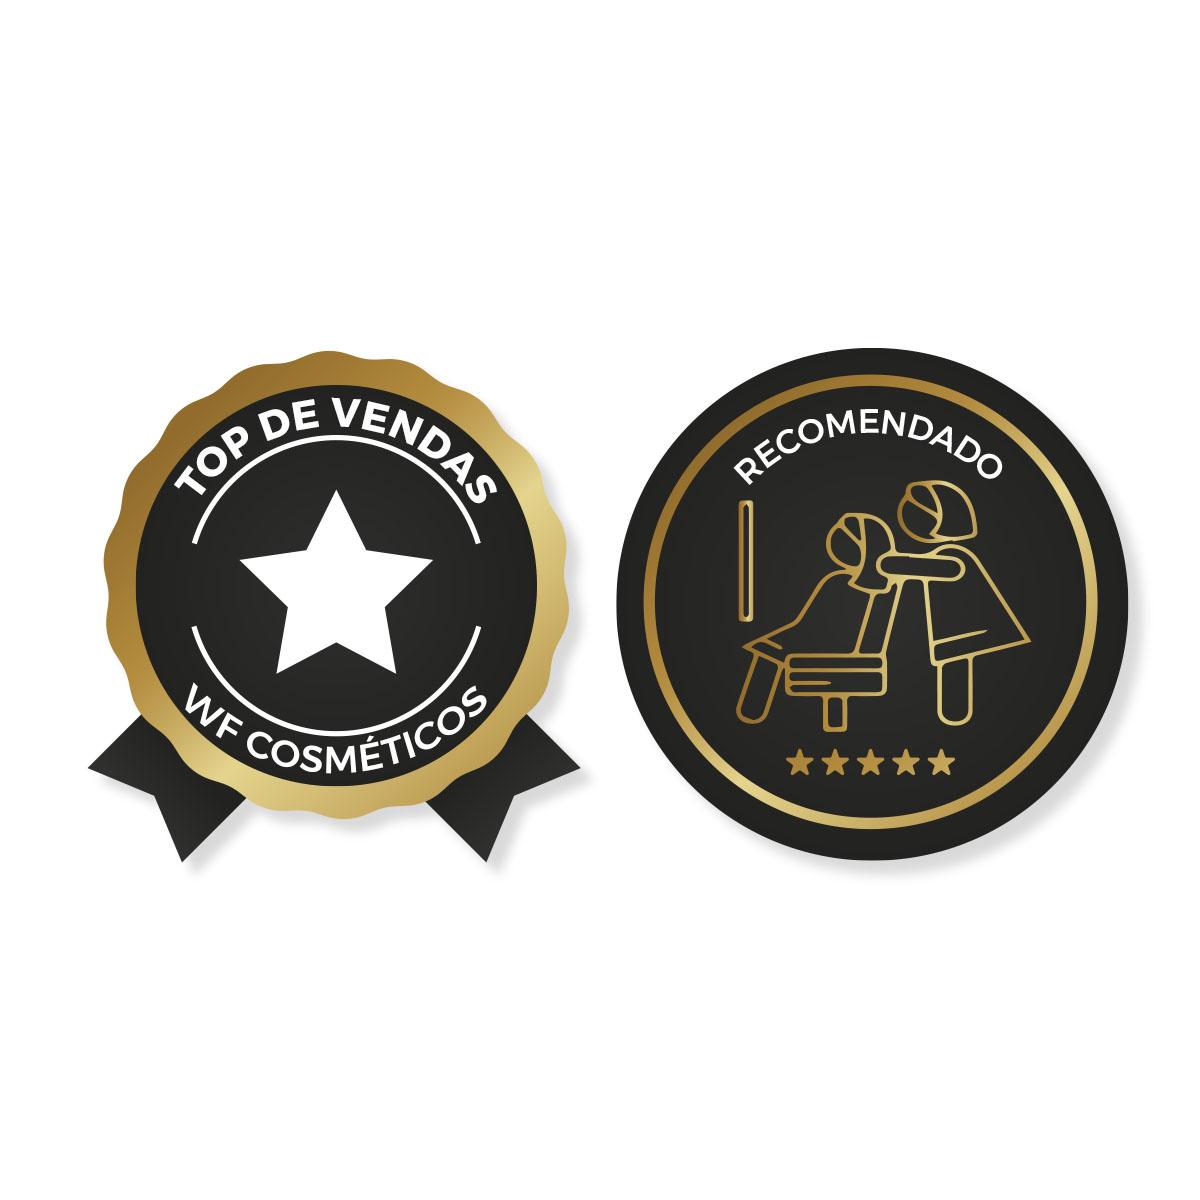 ALL REPAIR - CONDICIONADOR ELASTICITY FORCE CONTROL WF COSMETICOS 300ML